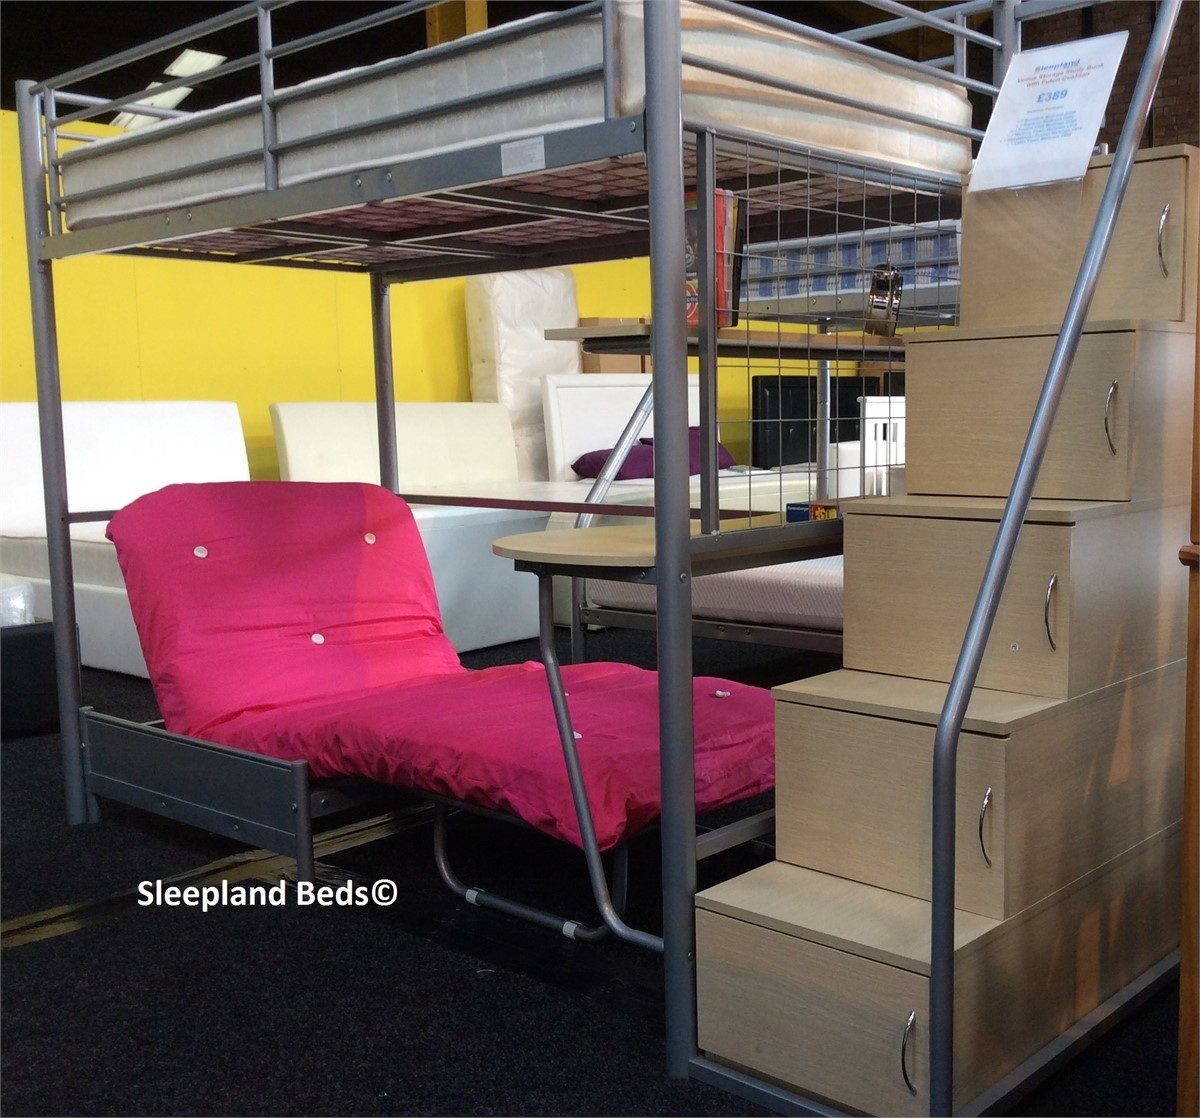 Venus Luxury High Sleeper Bunk Bed | Sleepland Beds